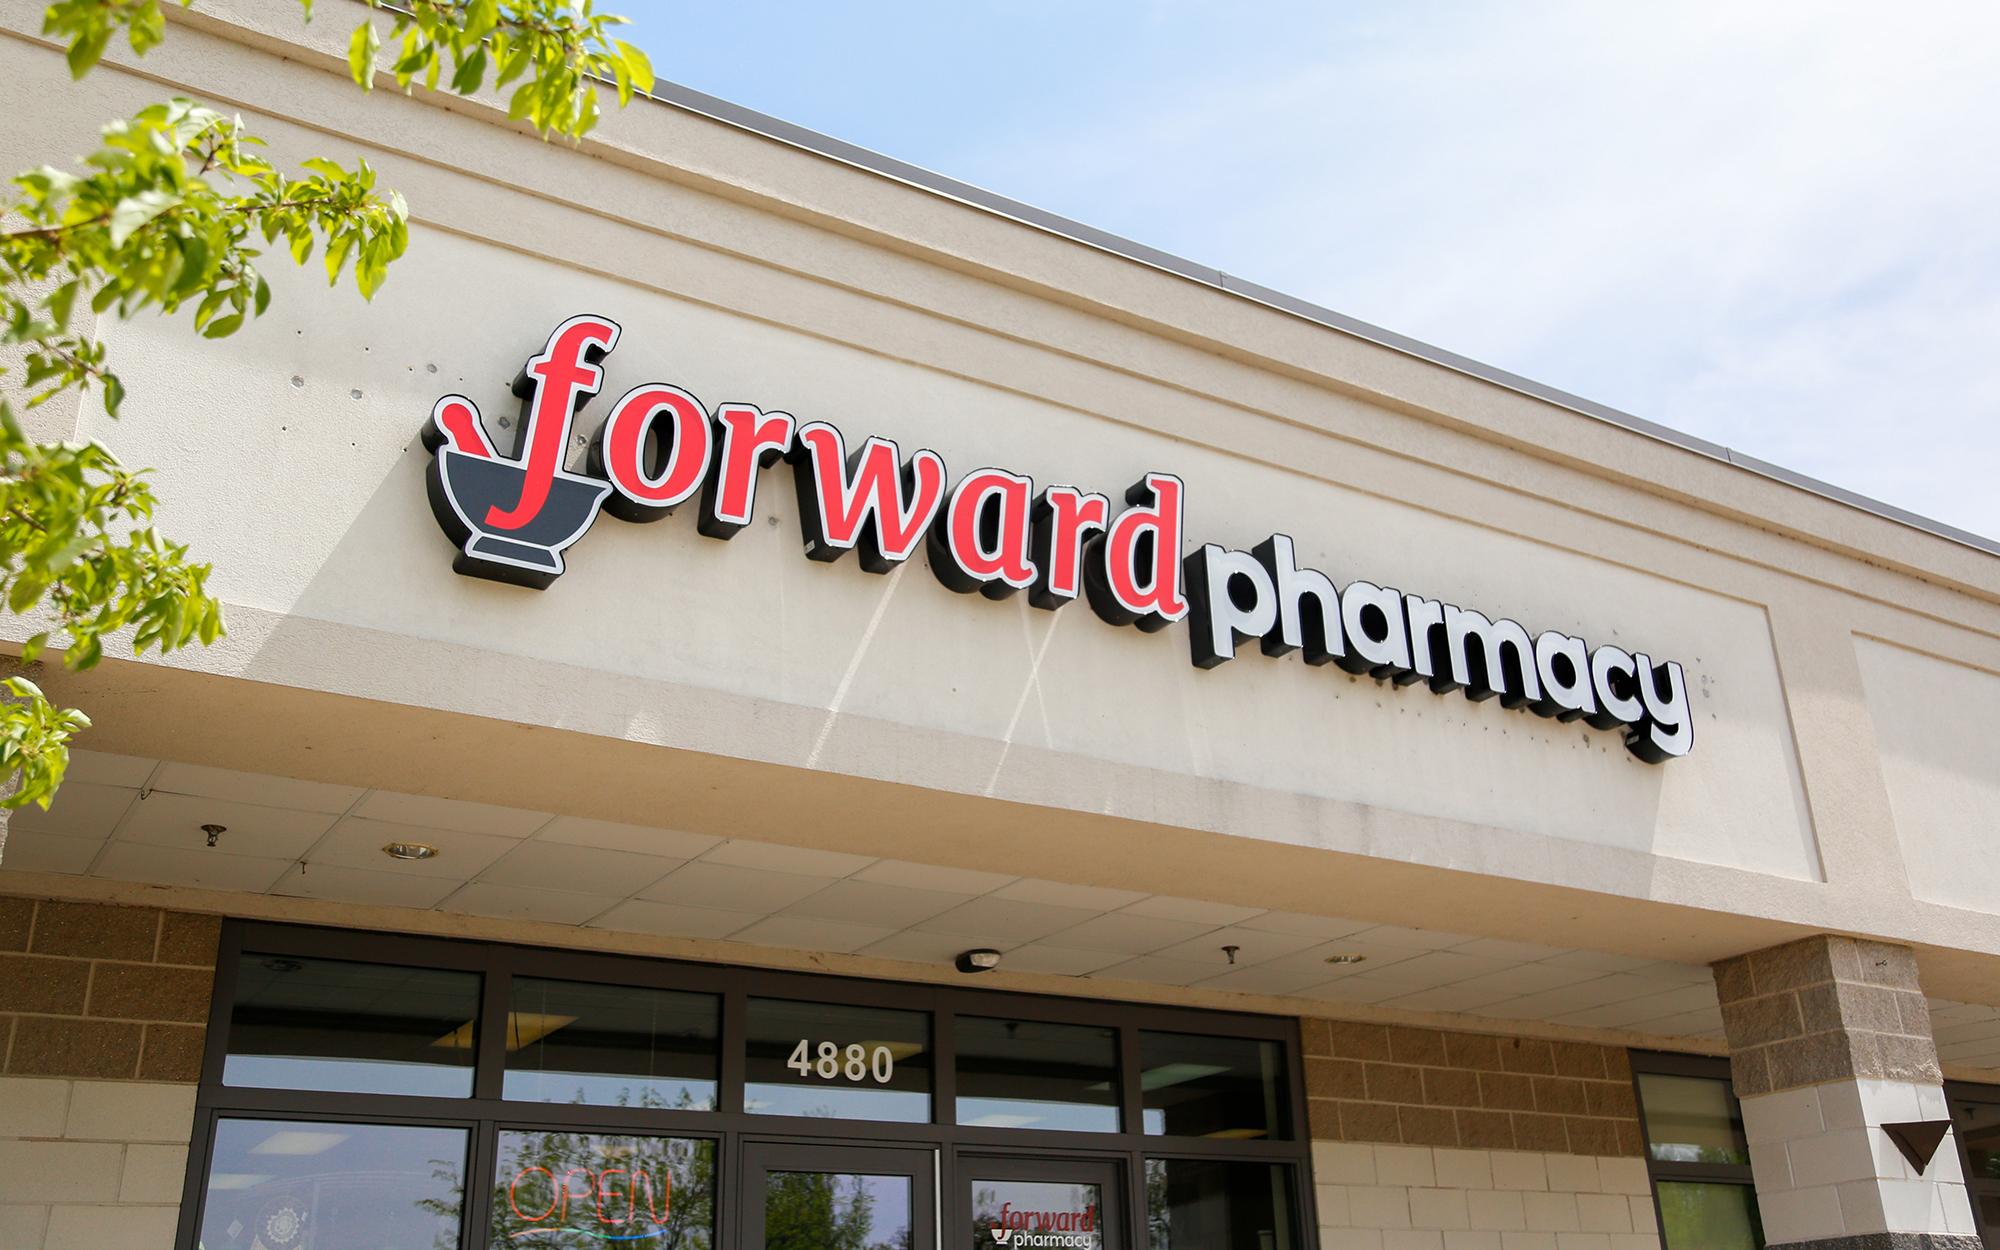 McFarland Pharmacy Exterior